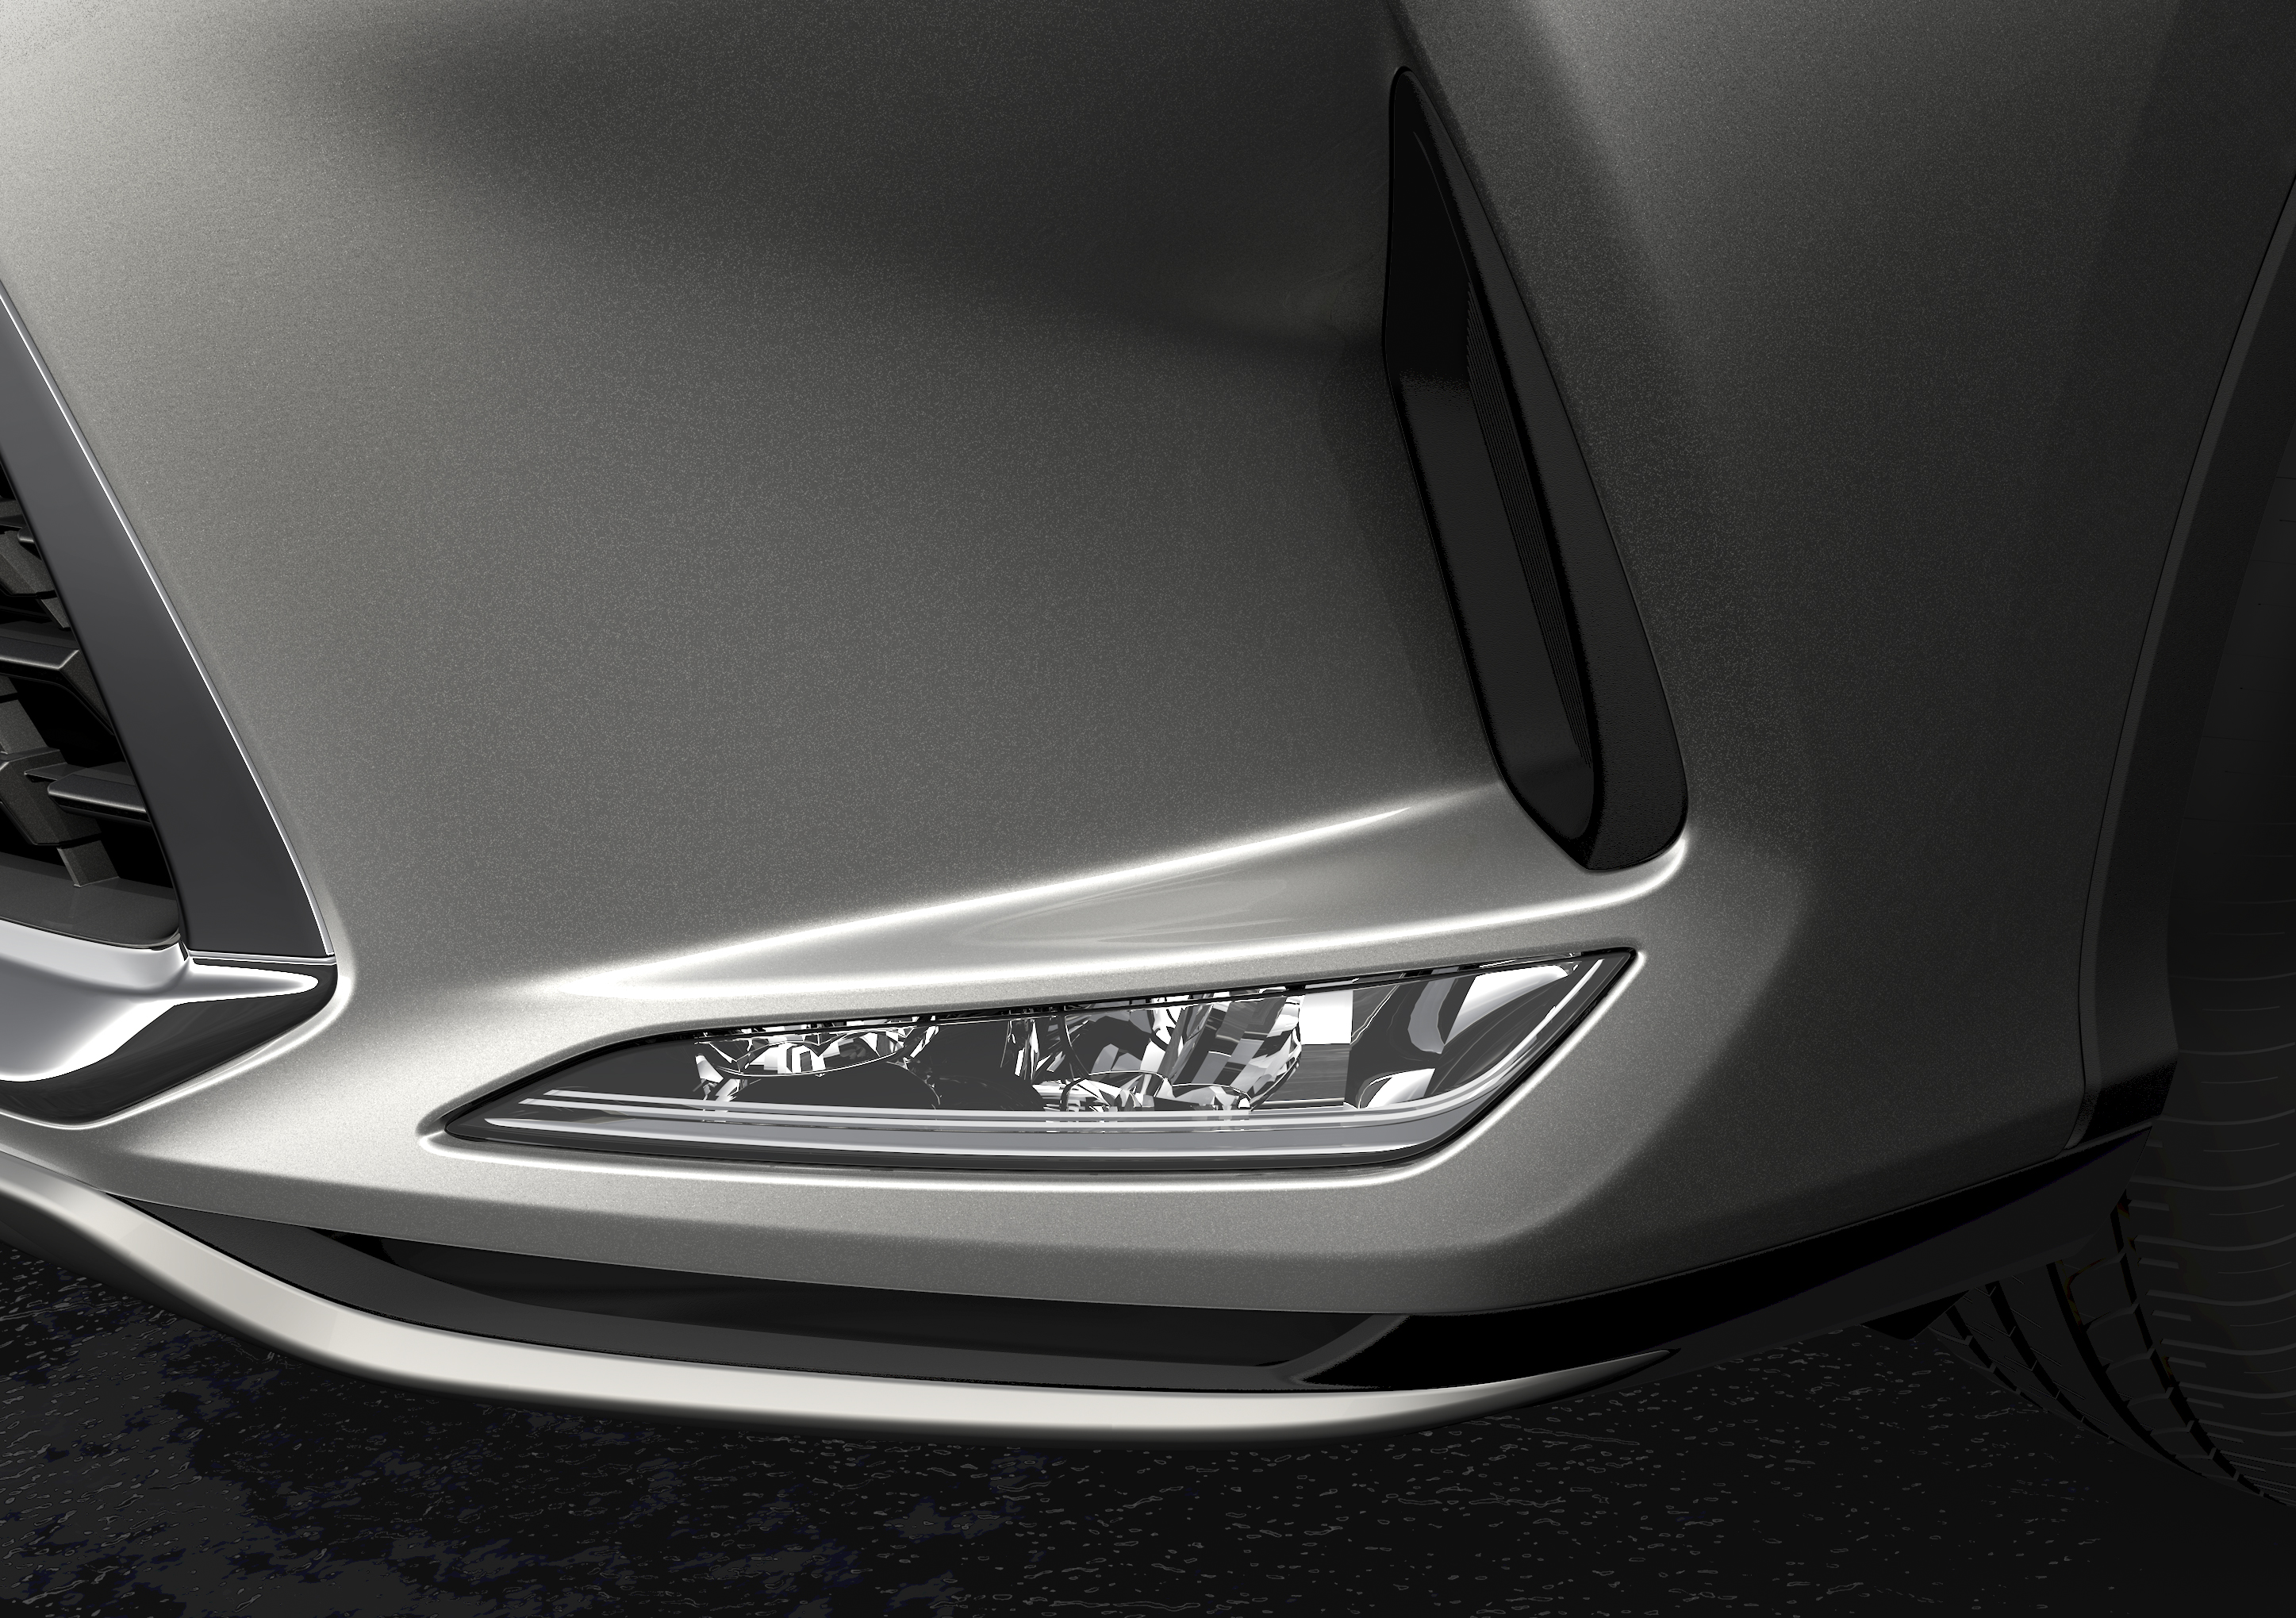 New Lexus RX gets super-cool BladeScan adaptive high beams